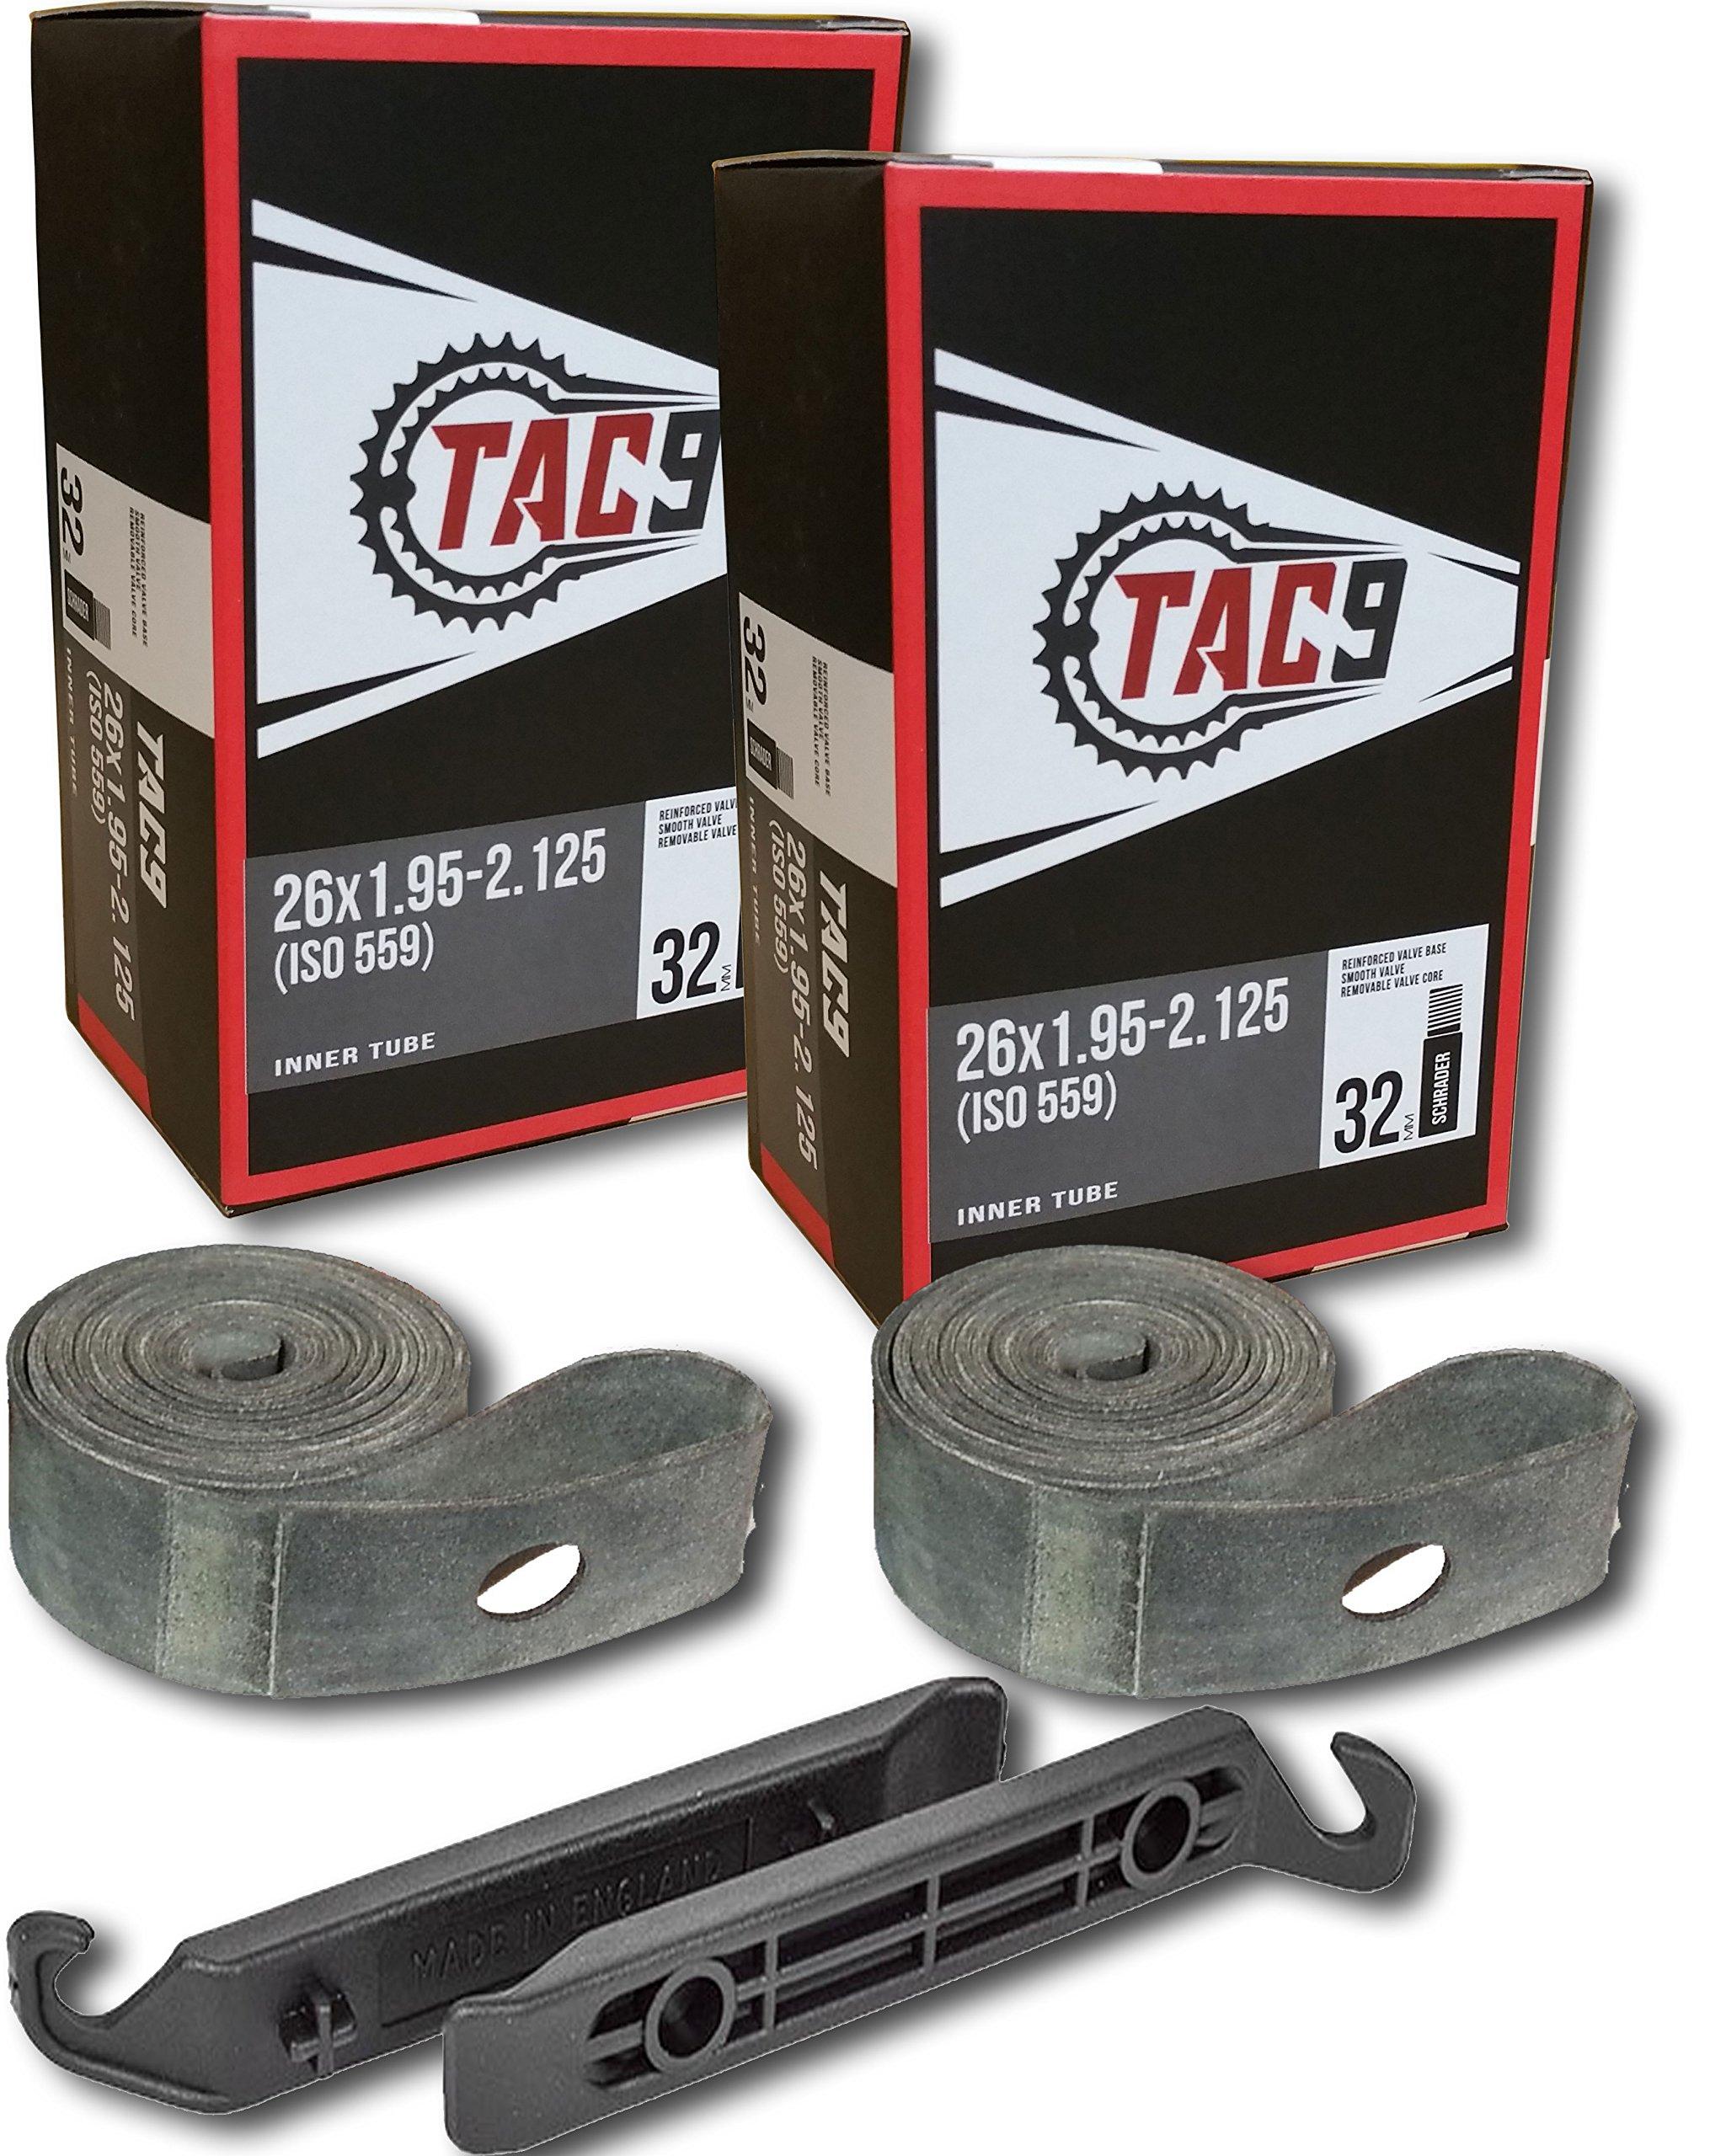 TAC 9 2 Pack Bike Tubes, 26 x 1.95-2.125'' Regular Valve 32mm - Tubes, Rim Strips and Tire Levers Bundle by TAC 9